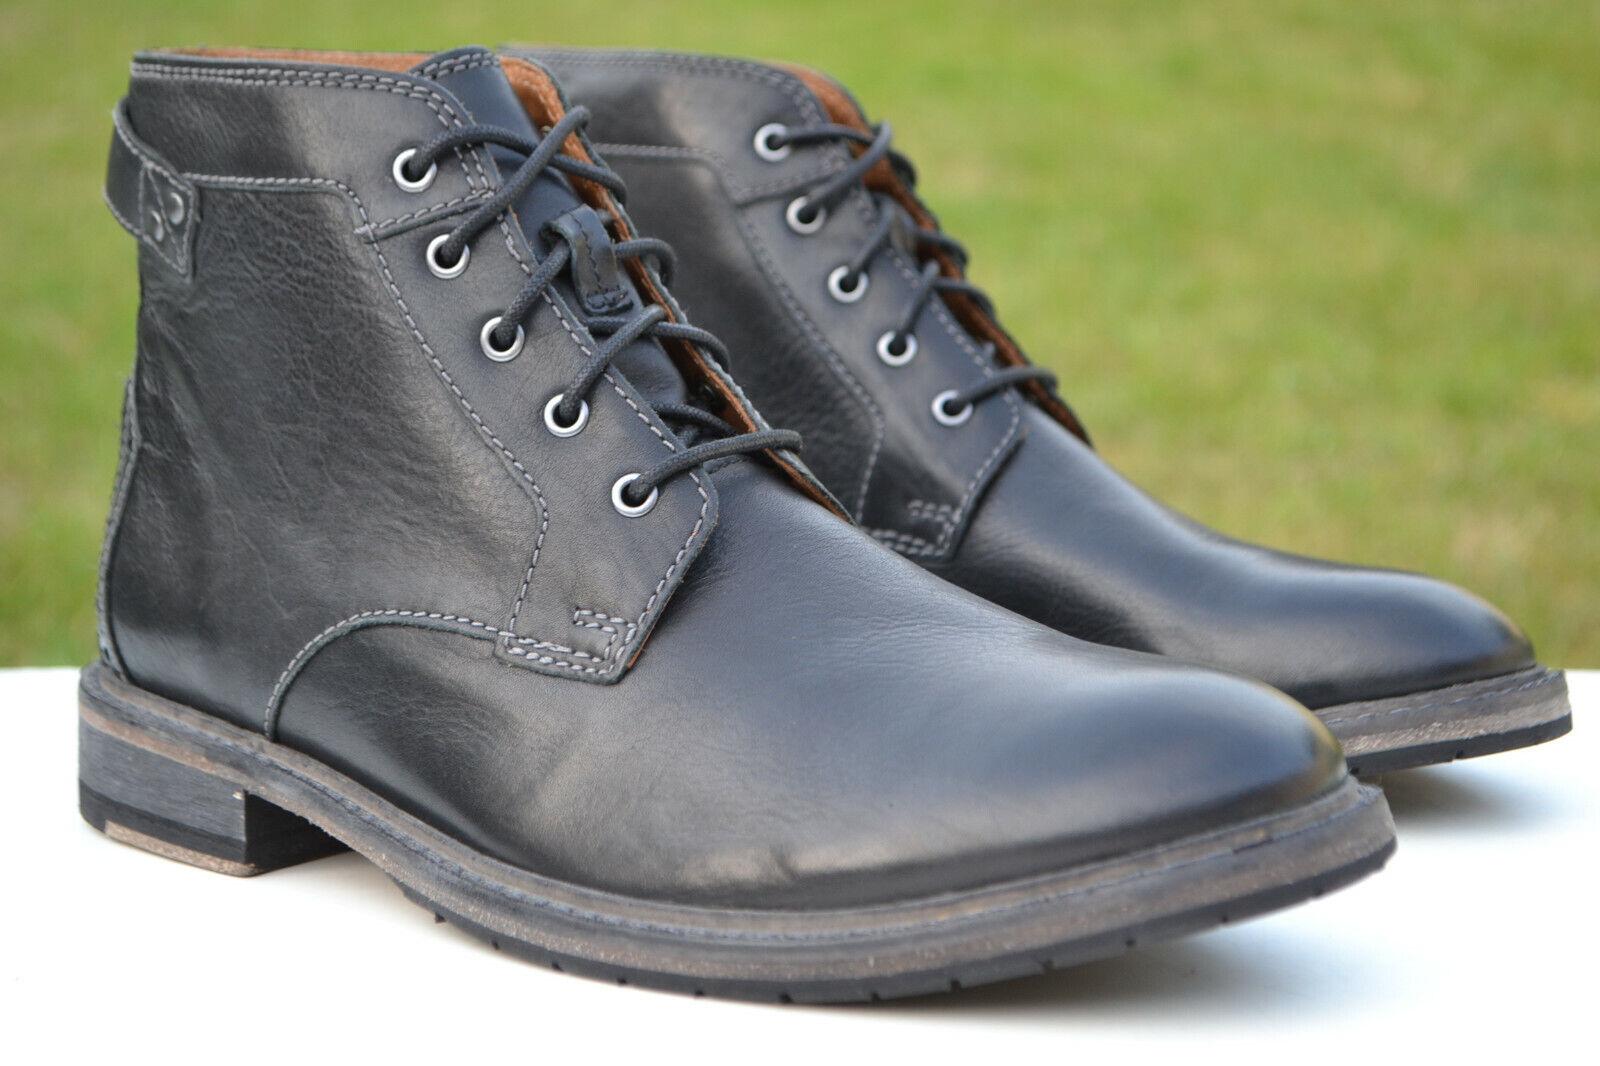 Clarks BNIB Mens Boots CLARKDALE BUD Black Leather UK 11 / 46 RRP